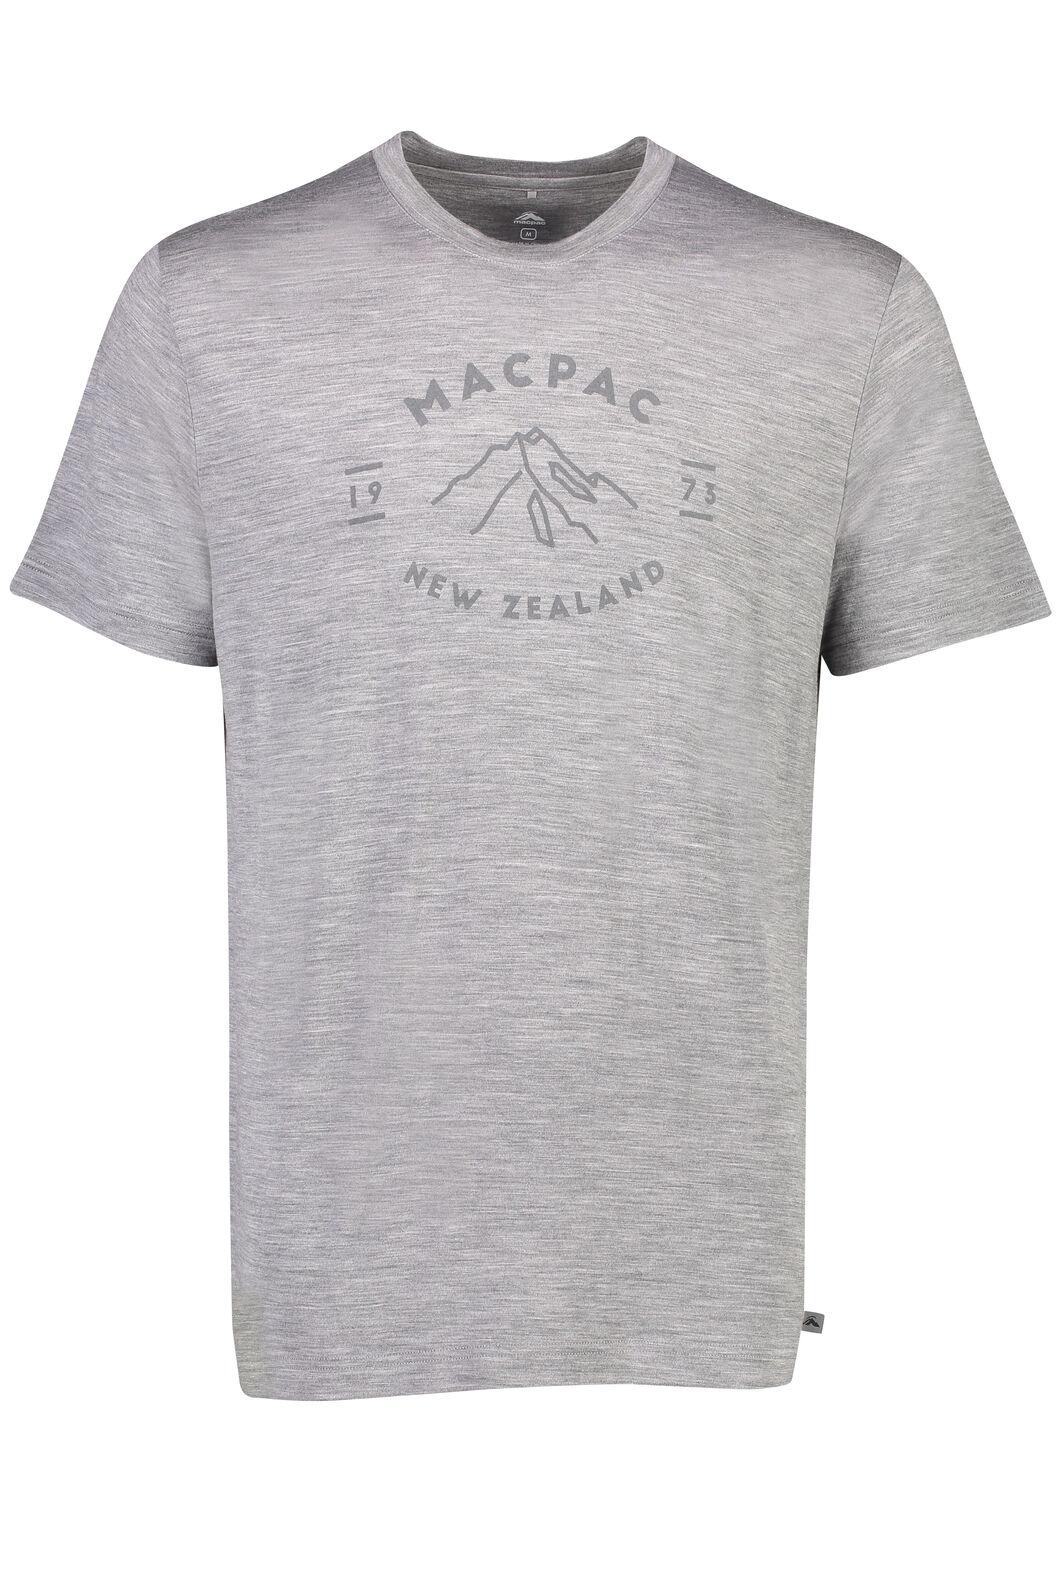 Macpac Mountain  Merino 180 Tee - Men's, Mid Grey Marle, hi-res